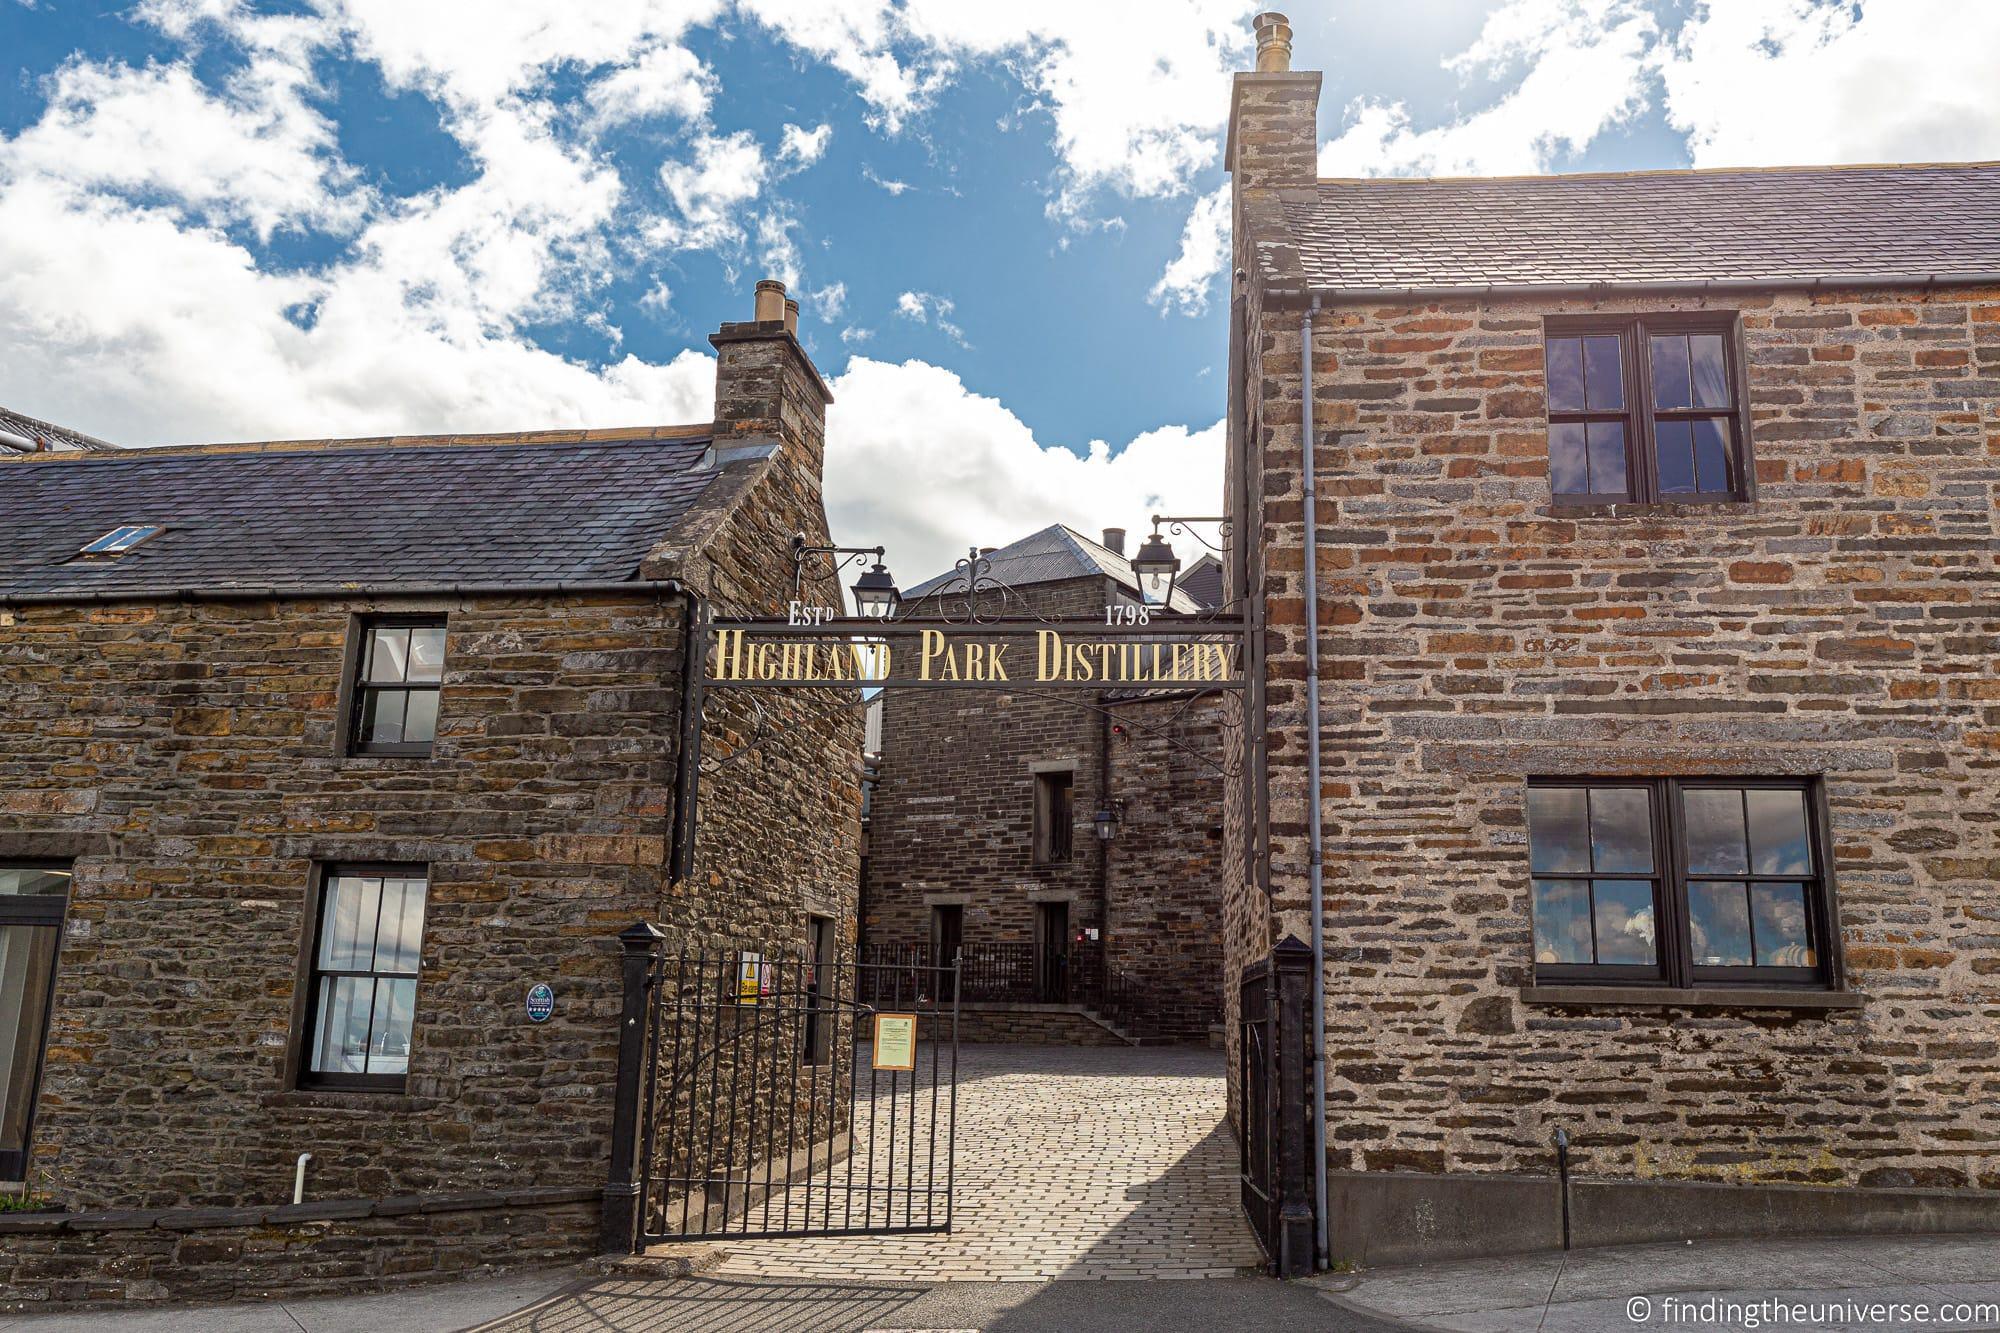 HIghland Park Whisky Distillery